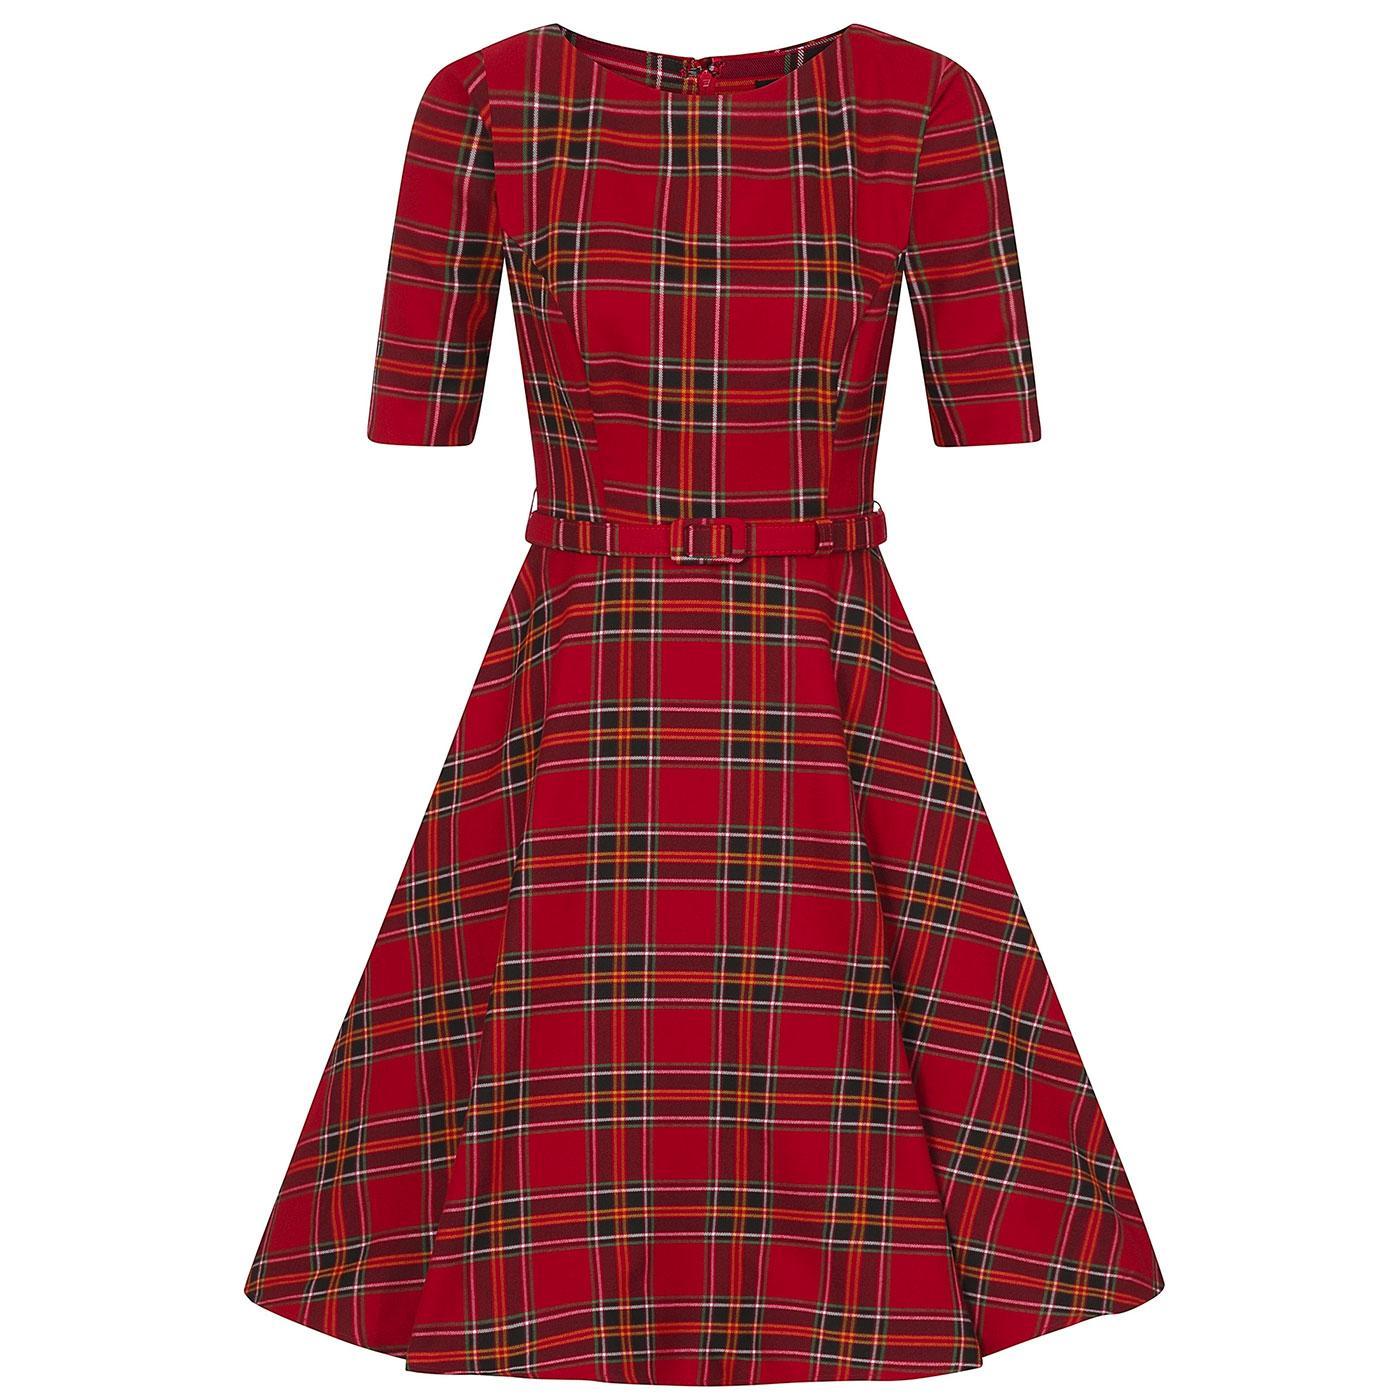 Suzanne COLLECTIF Berry Check Retro Swing Dress